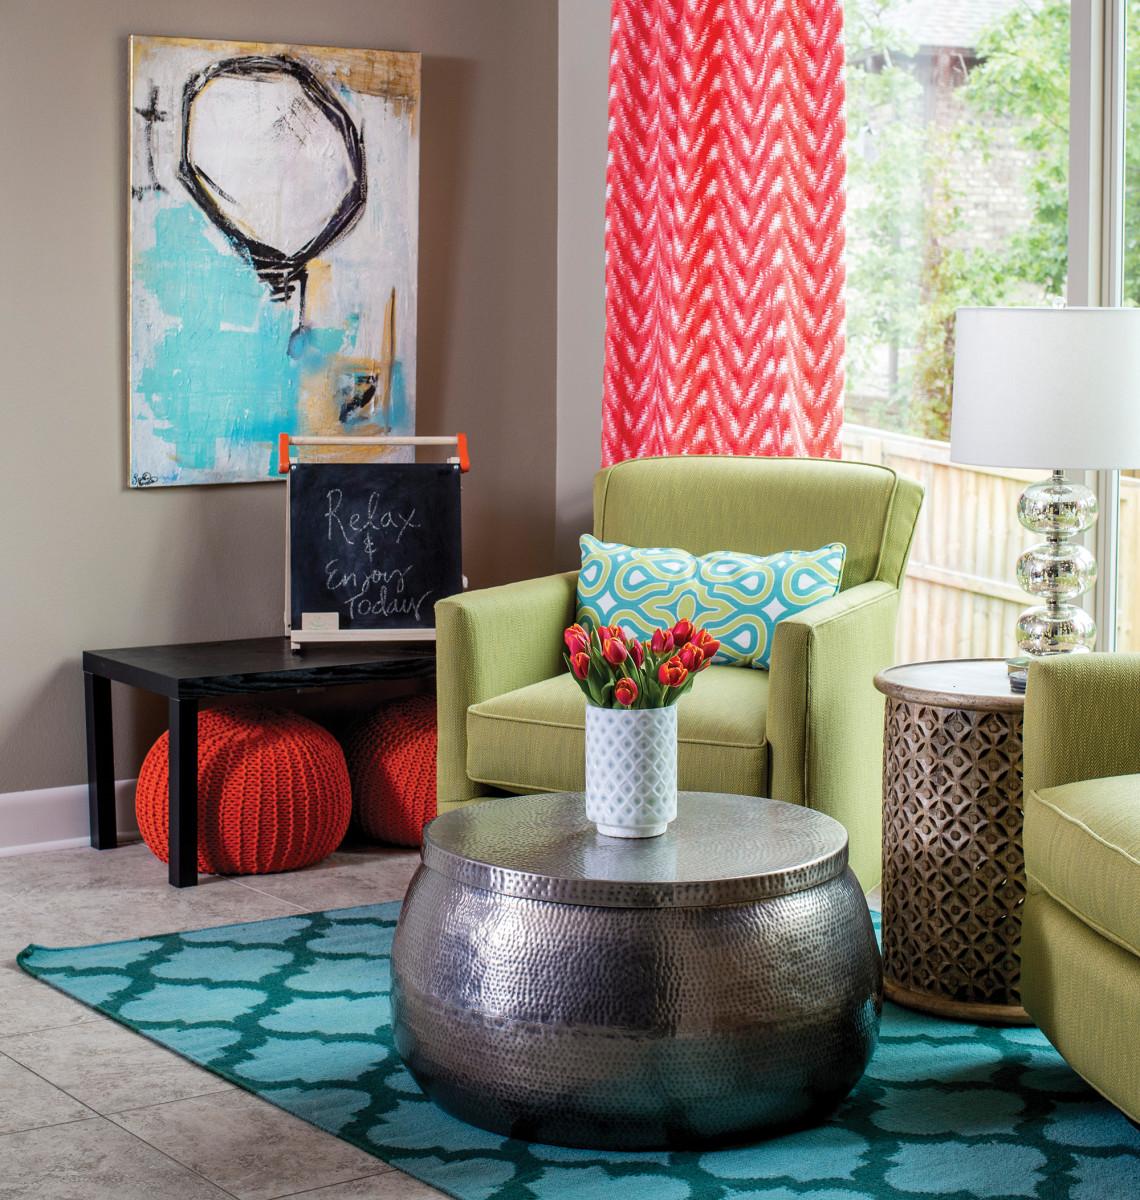 KES Photo | Karen E. Segrave  Lindsey Binz Home  Ramsay Home